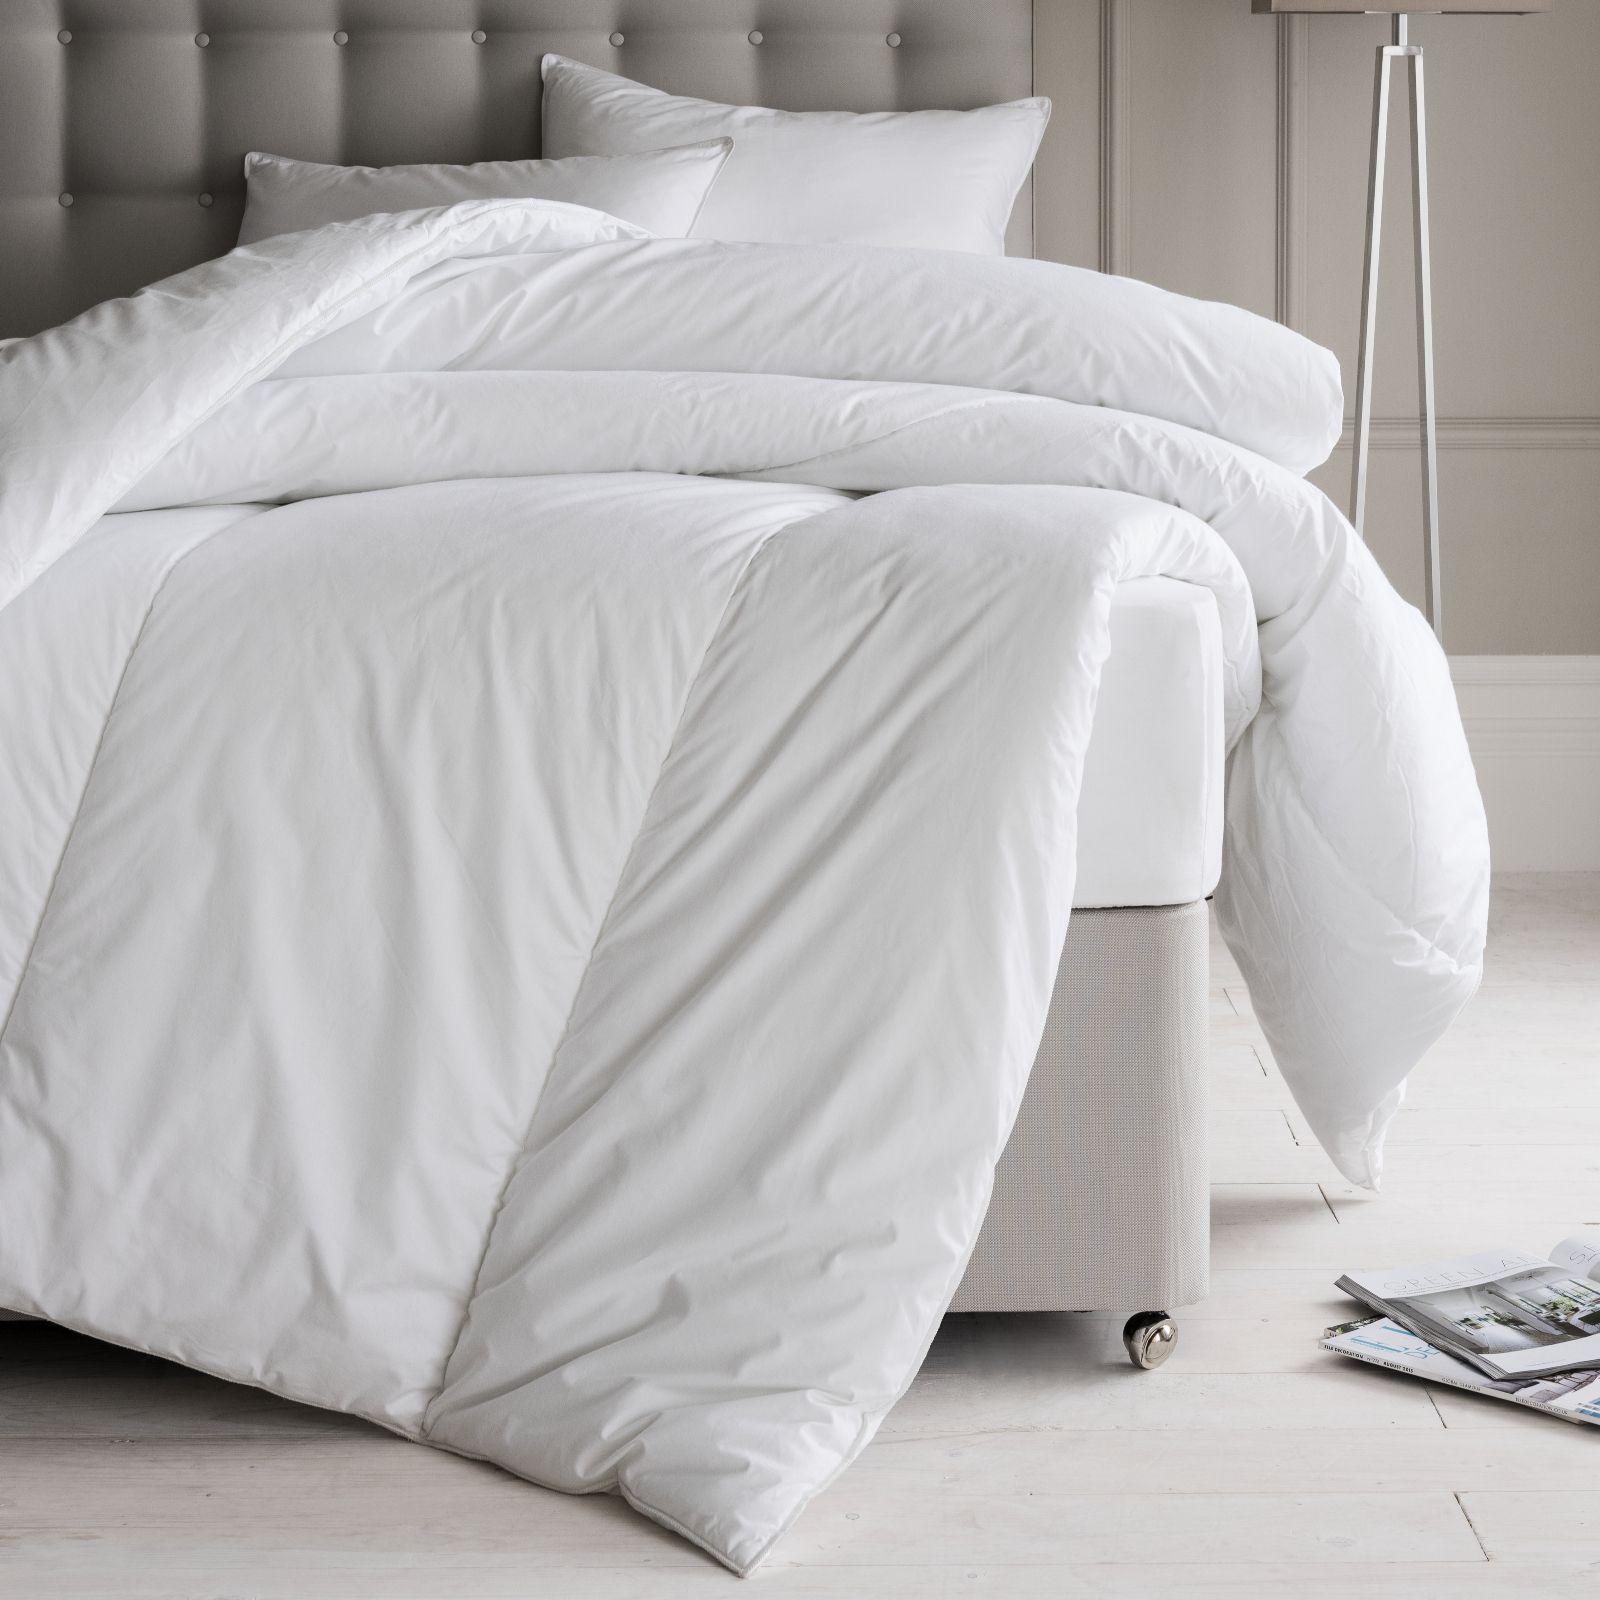 Silentnight Pure Cotton Anti Allergens All Season 9 4 5 Tog Duvet Qvc Uk